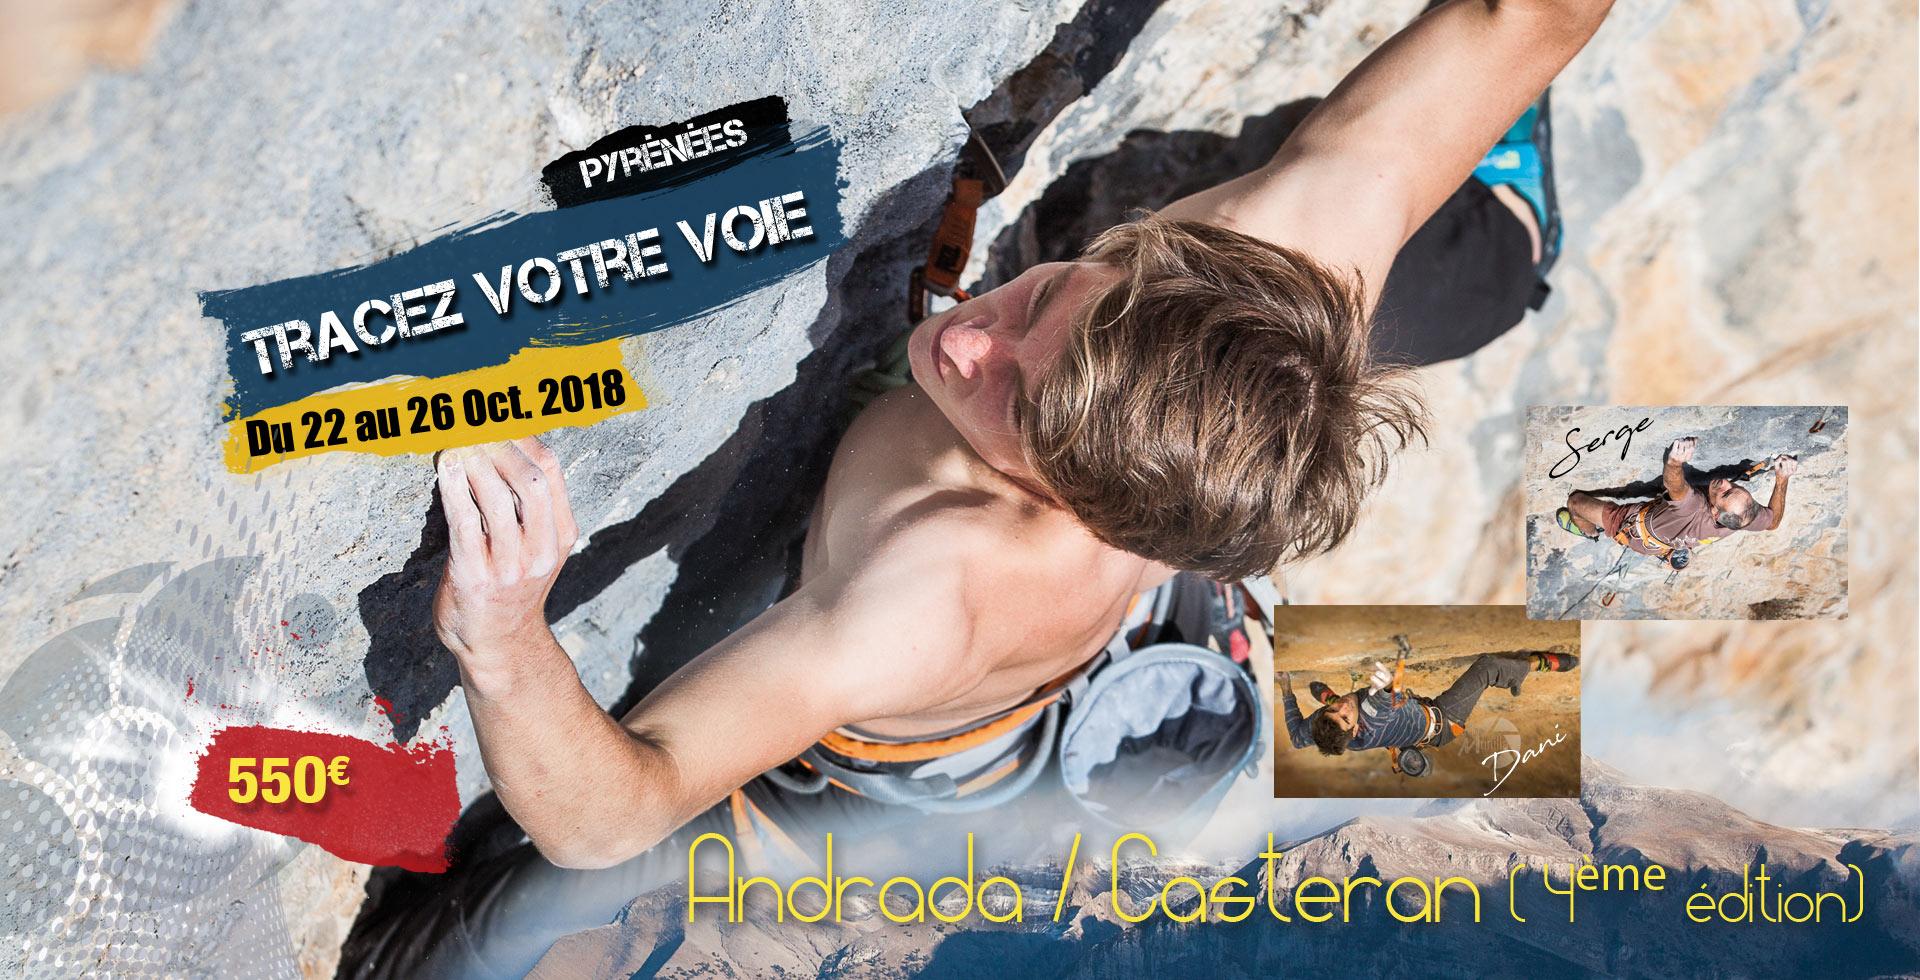 slider-escalade-casteran-pyrenees-4eme